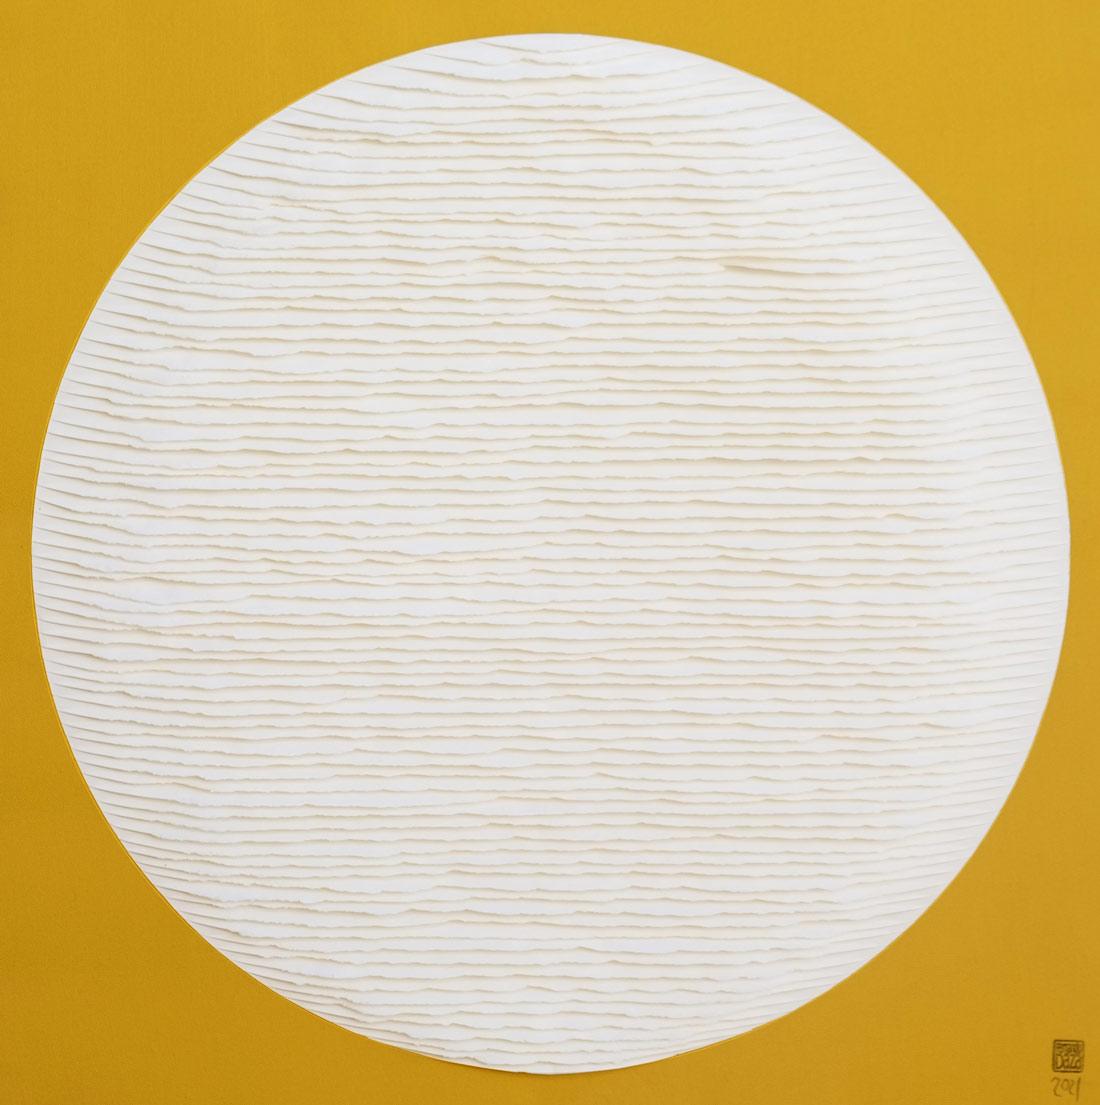 Rond-Blanc-sur-fond-jaune-packshot